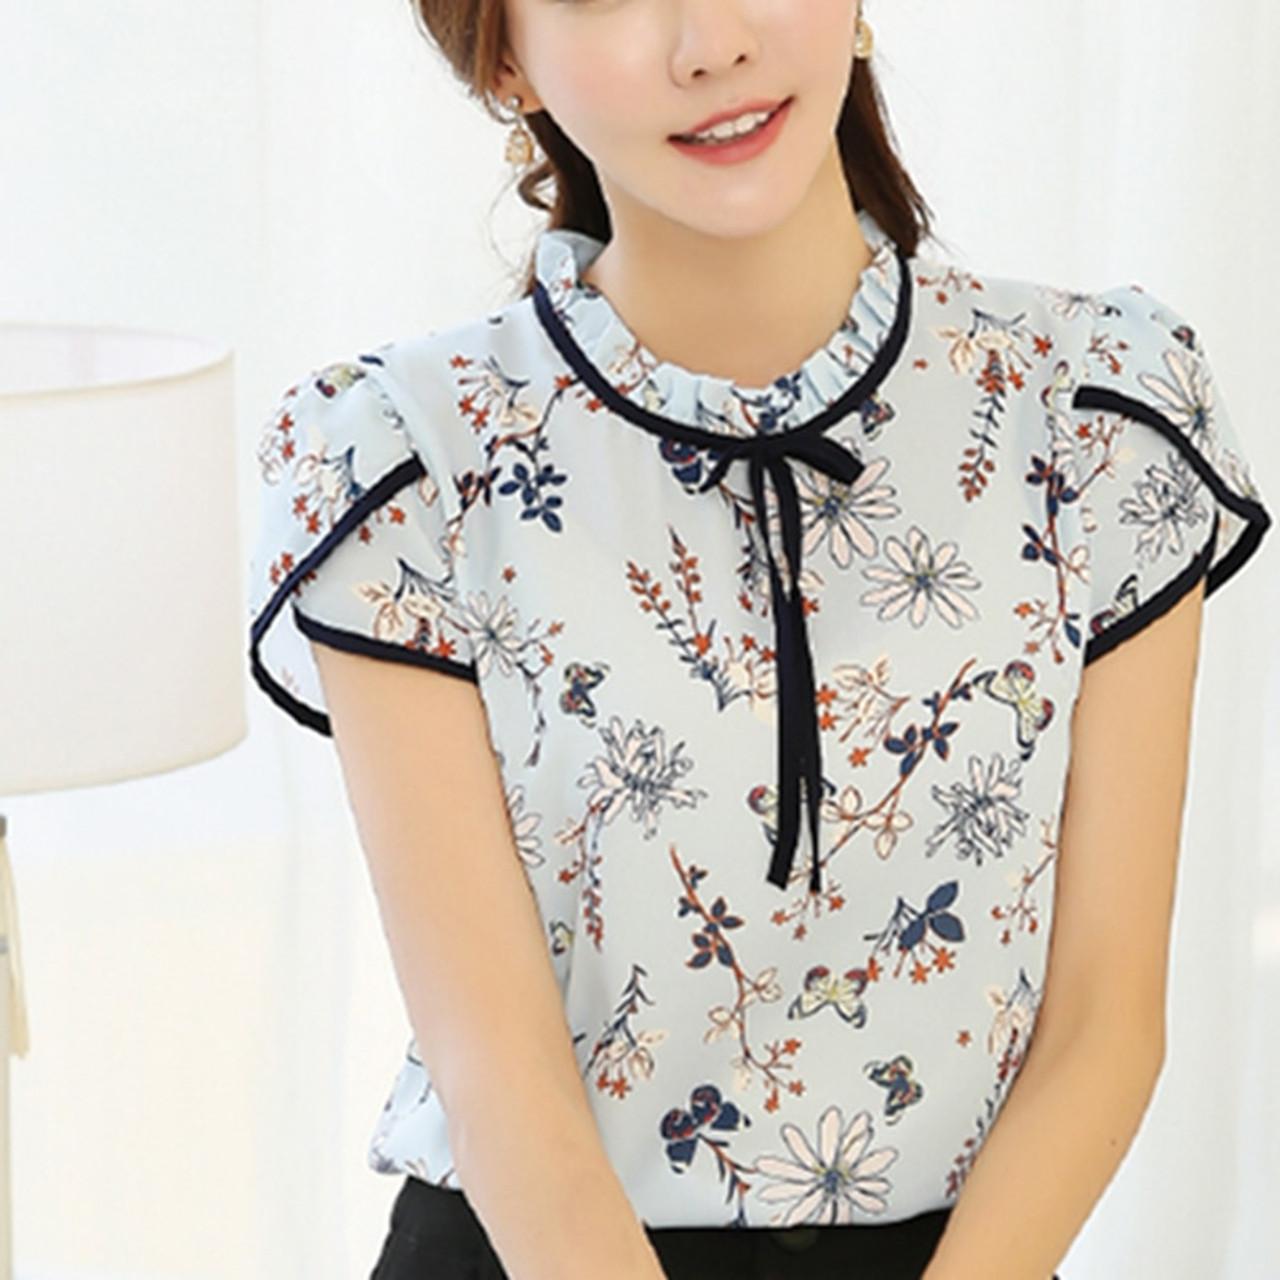 d94ccaae98 ... 2017 Summer Floral Print Chiffon Blouse Ruffled Collar Bow Neck Shirt  Petal Short Sleeve Chiffon Tops ...